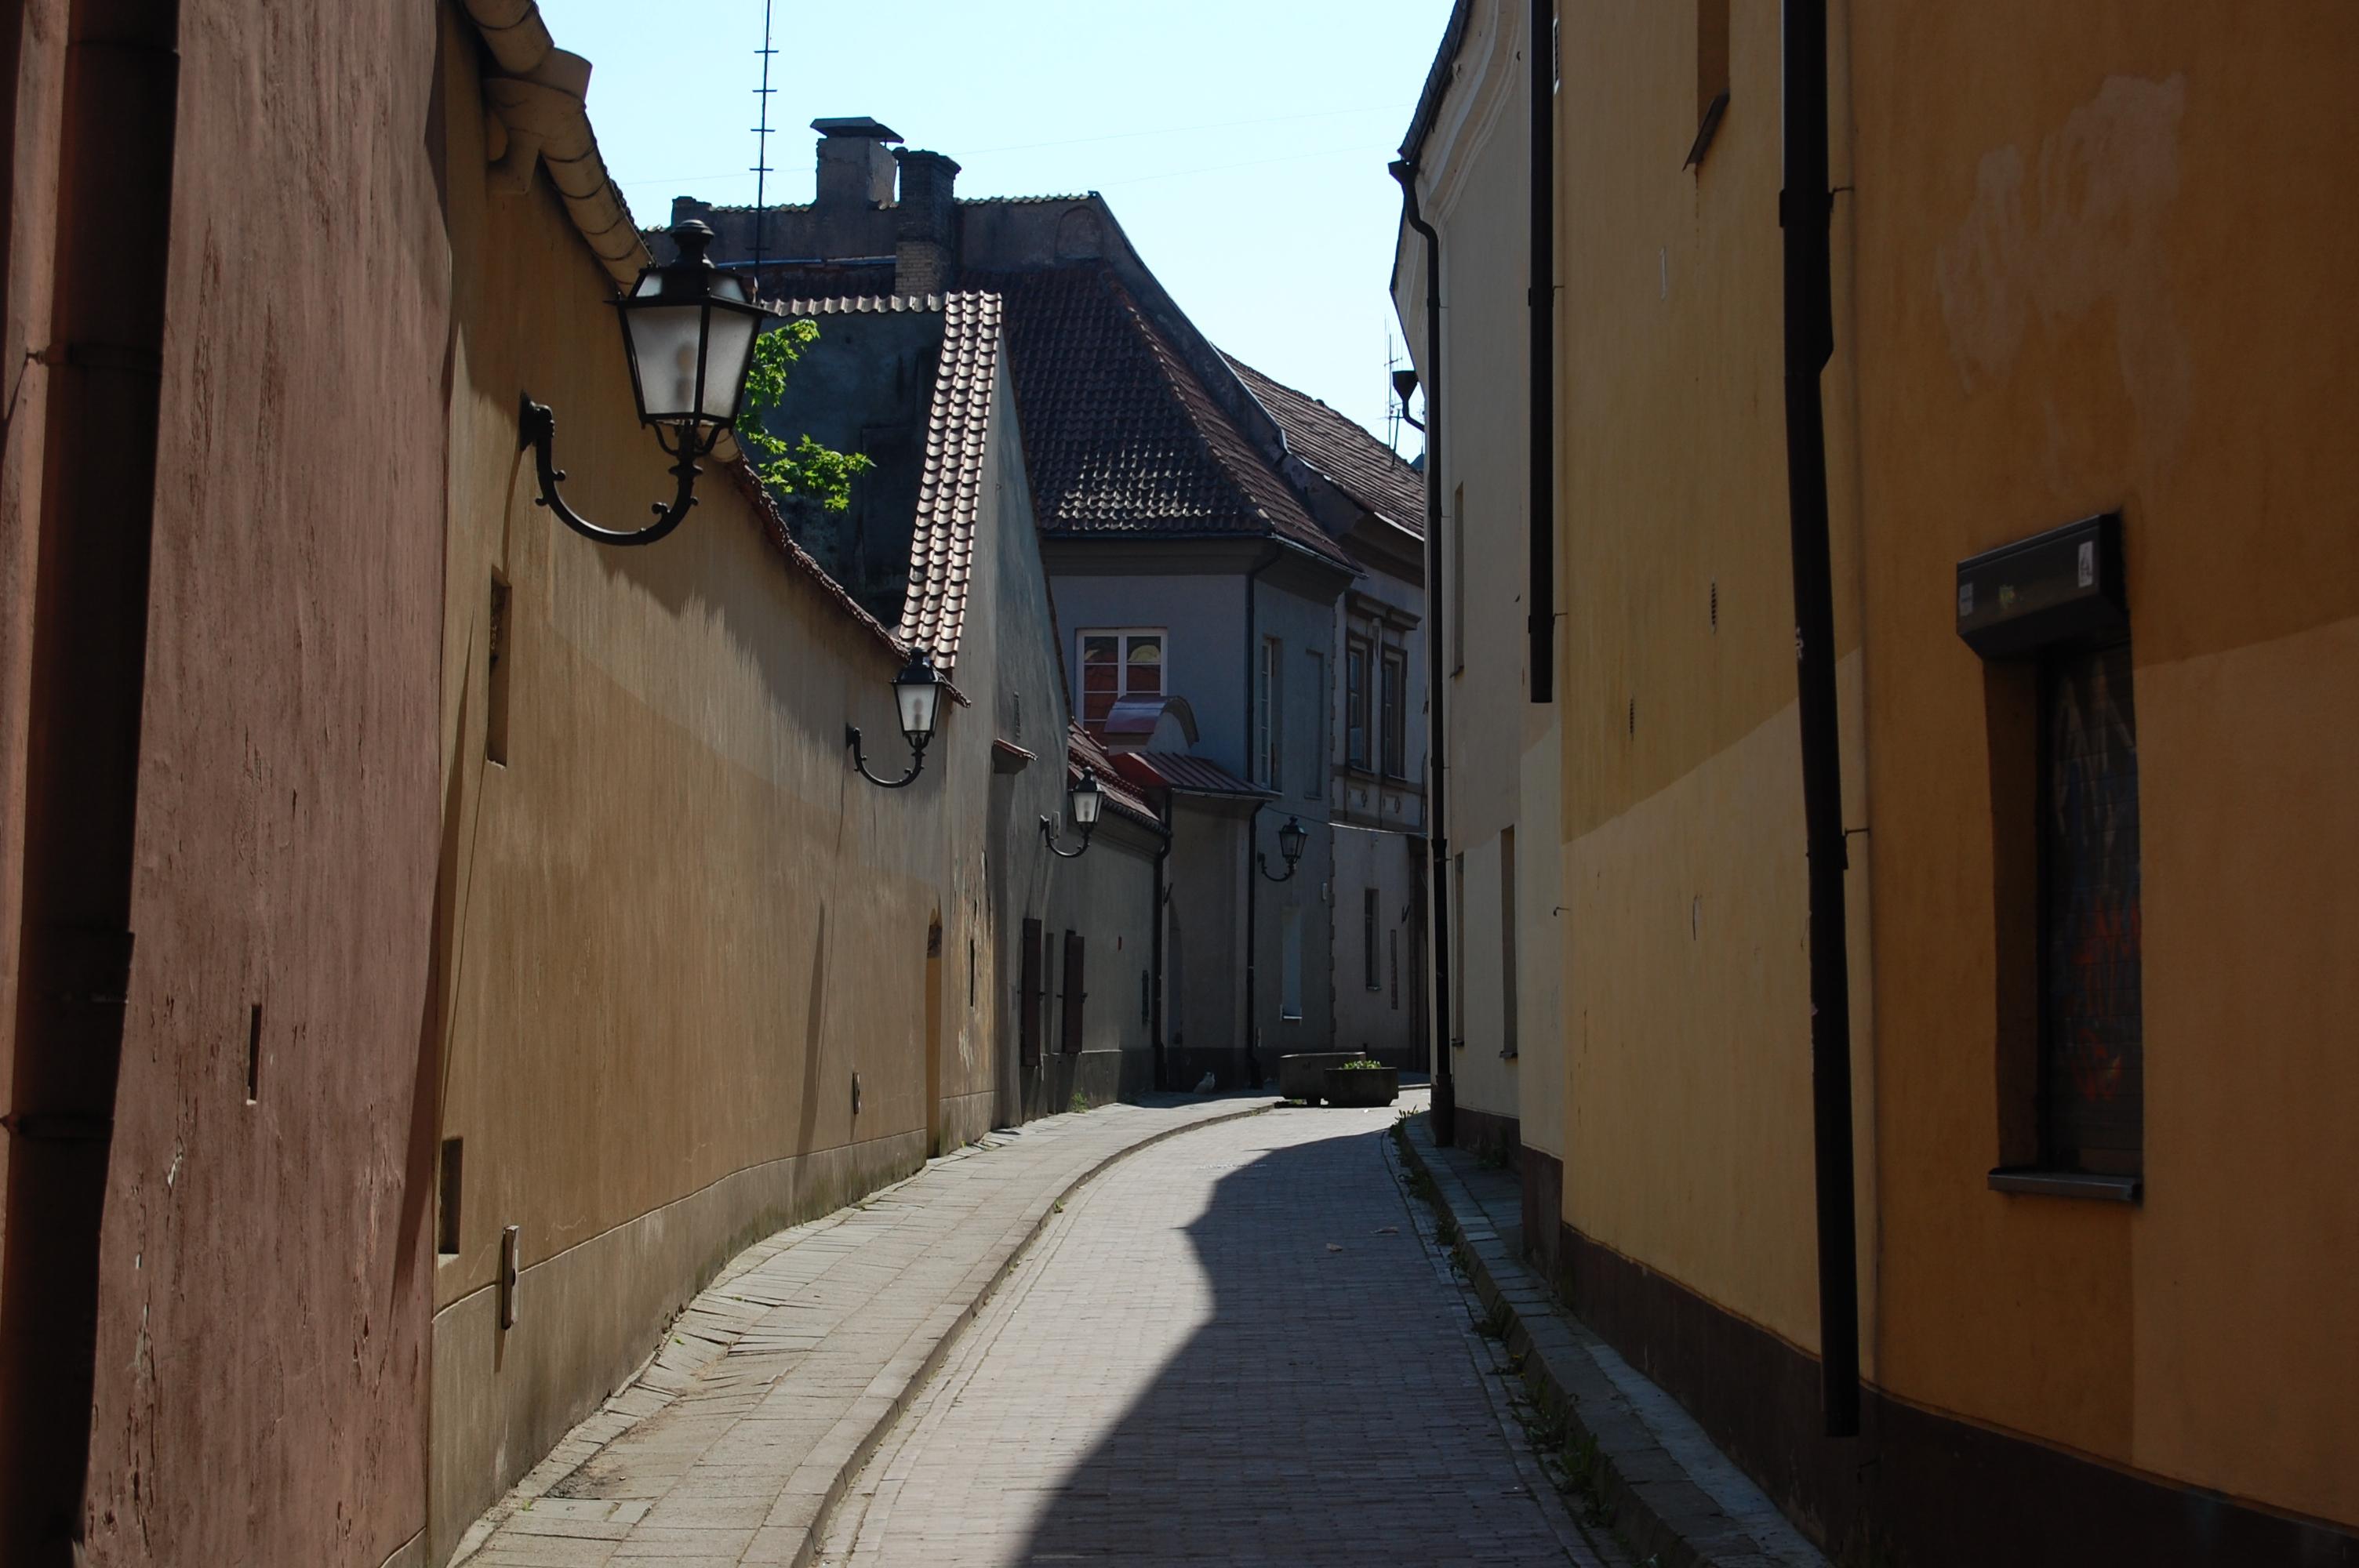 Vilniaus gatves online dating